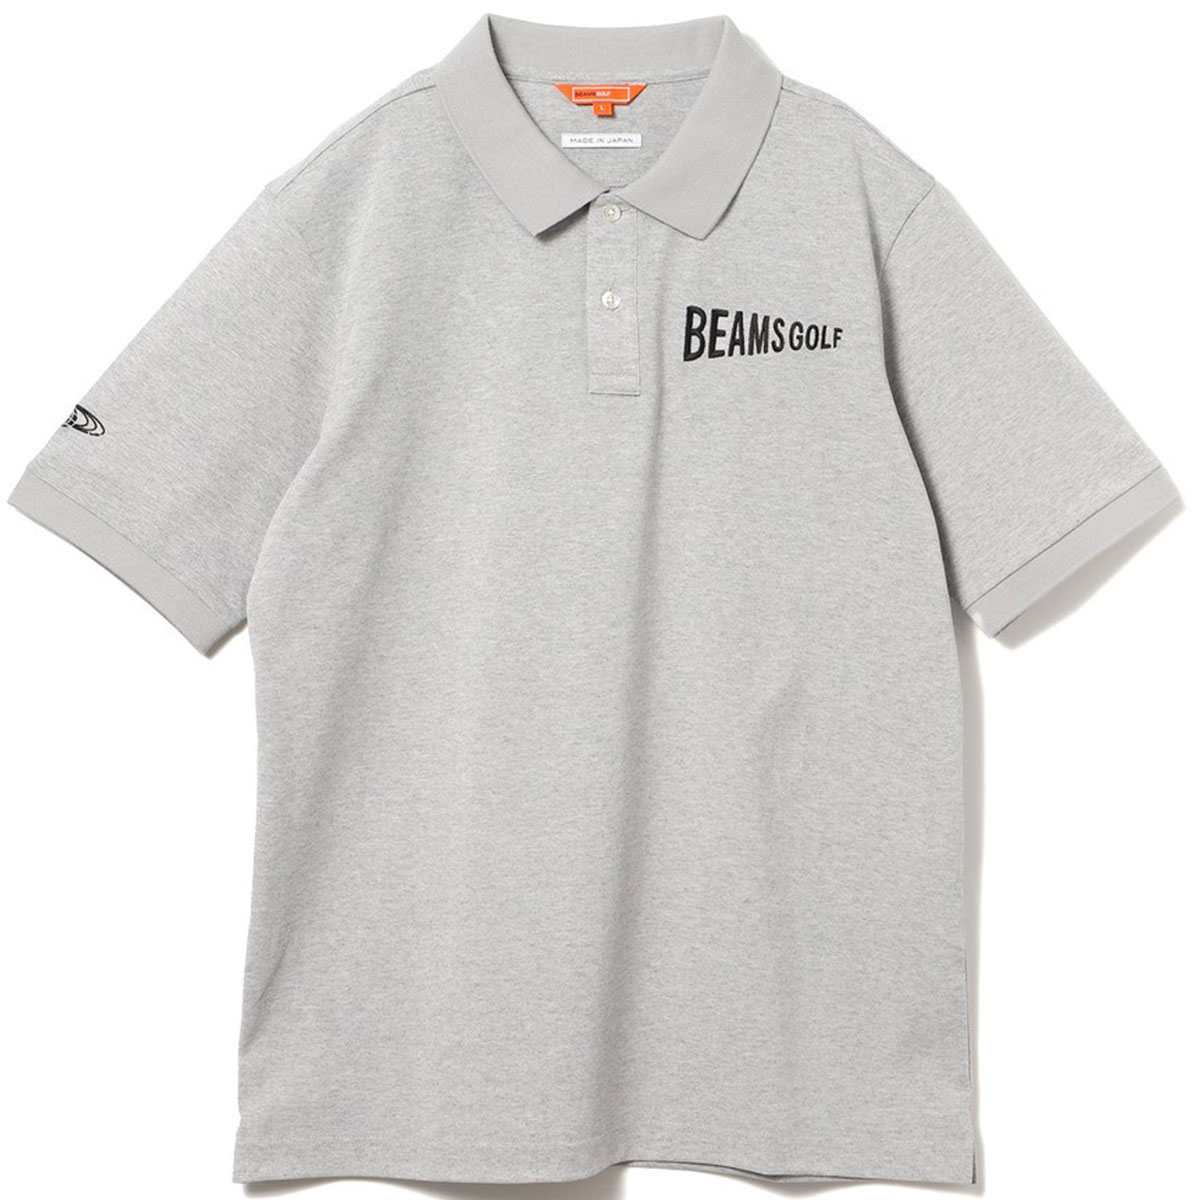 BEAMS GOLF ORANGE LABEL COOLMAX ポロシャツ